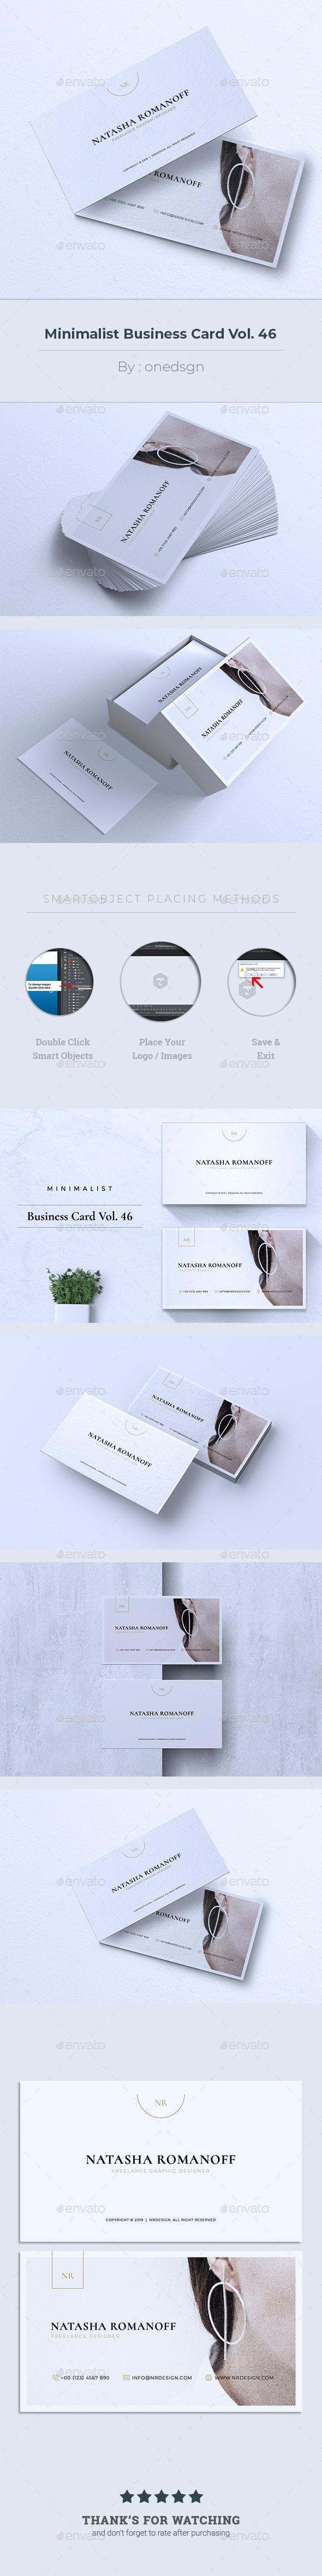 Minimalist Business Card Vol. 46 - Business Cards Print Templates